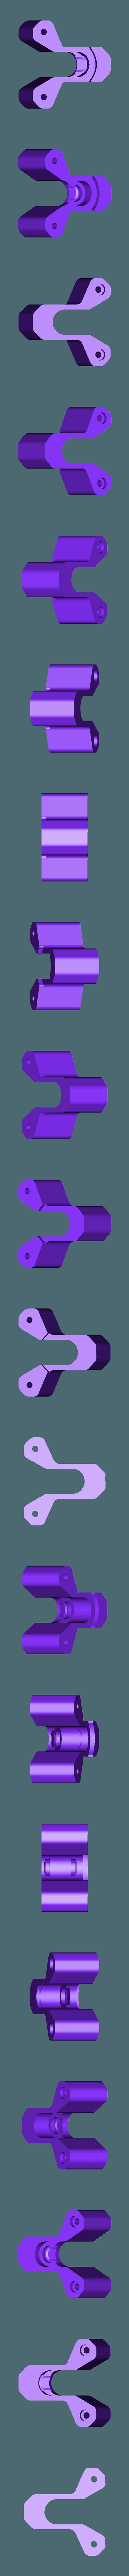 Gearhead_v2-0_98.STL Download free STL file Extruder Mount (Printrbot Gear Head) • 3D printable design, WalterHsiao